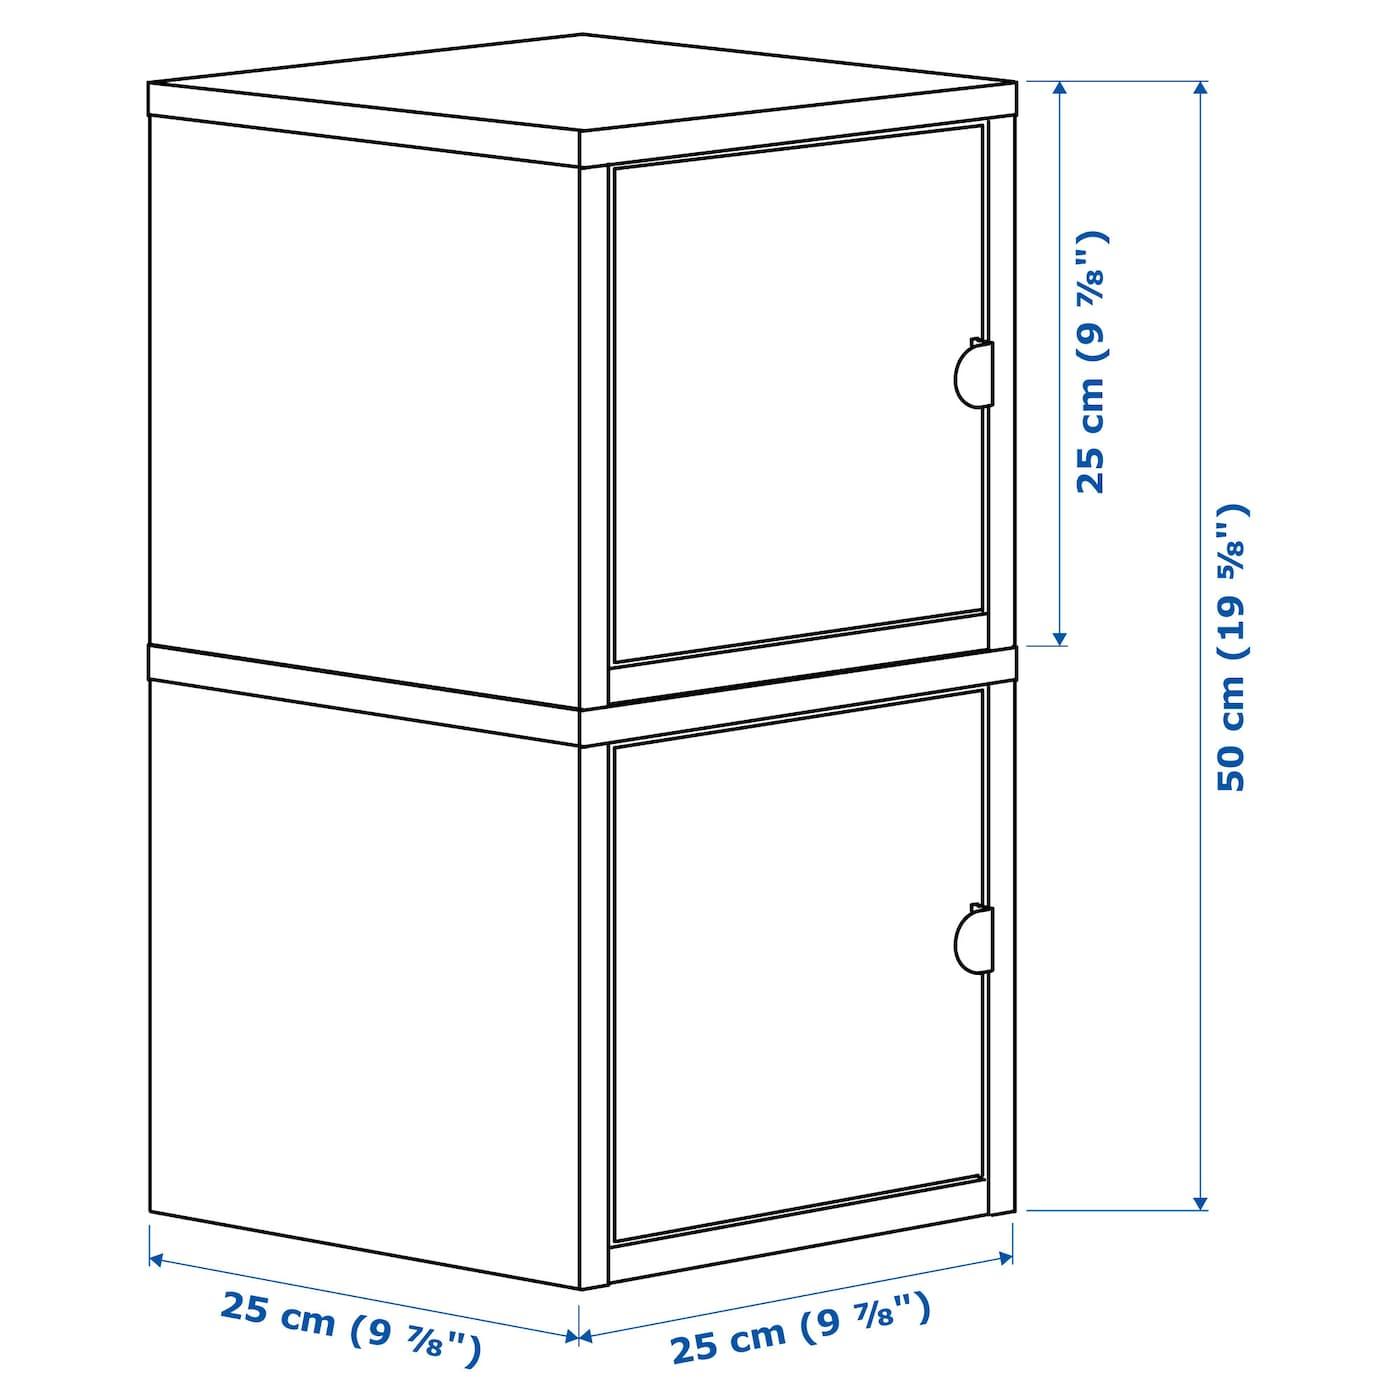 LIXHULT Förvaringskombination, vit, vit, 25x25x50 cm IKEA